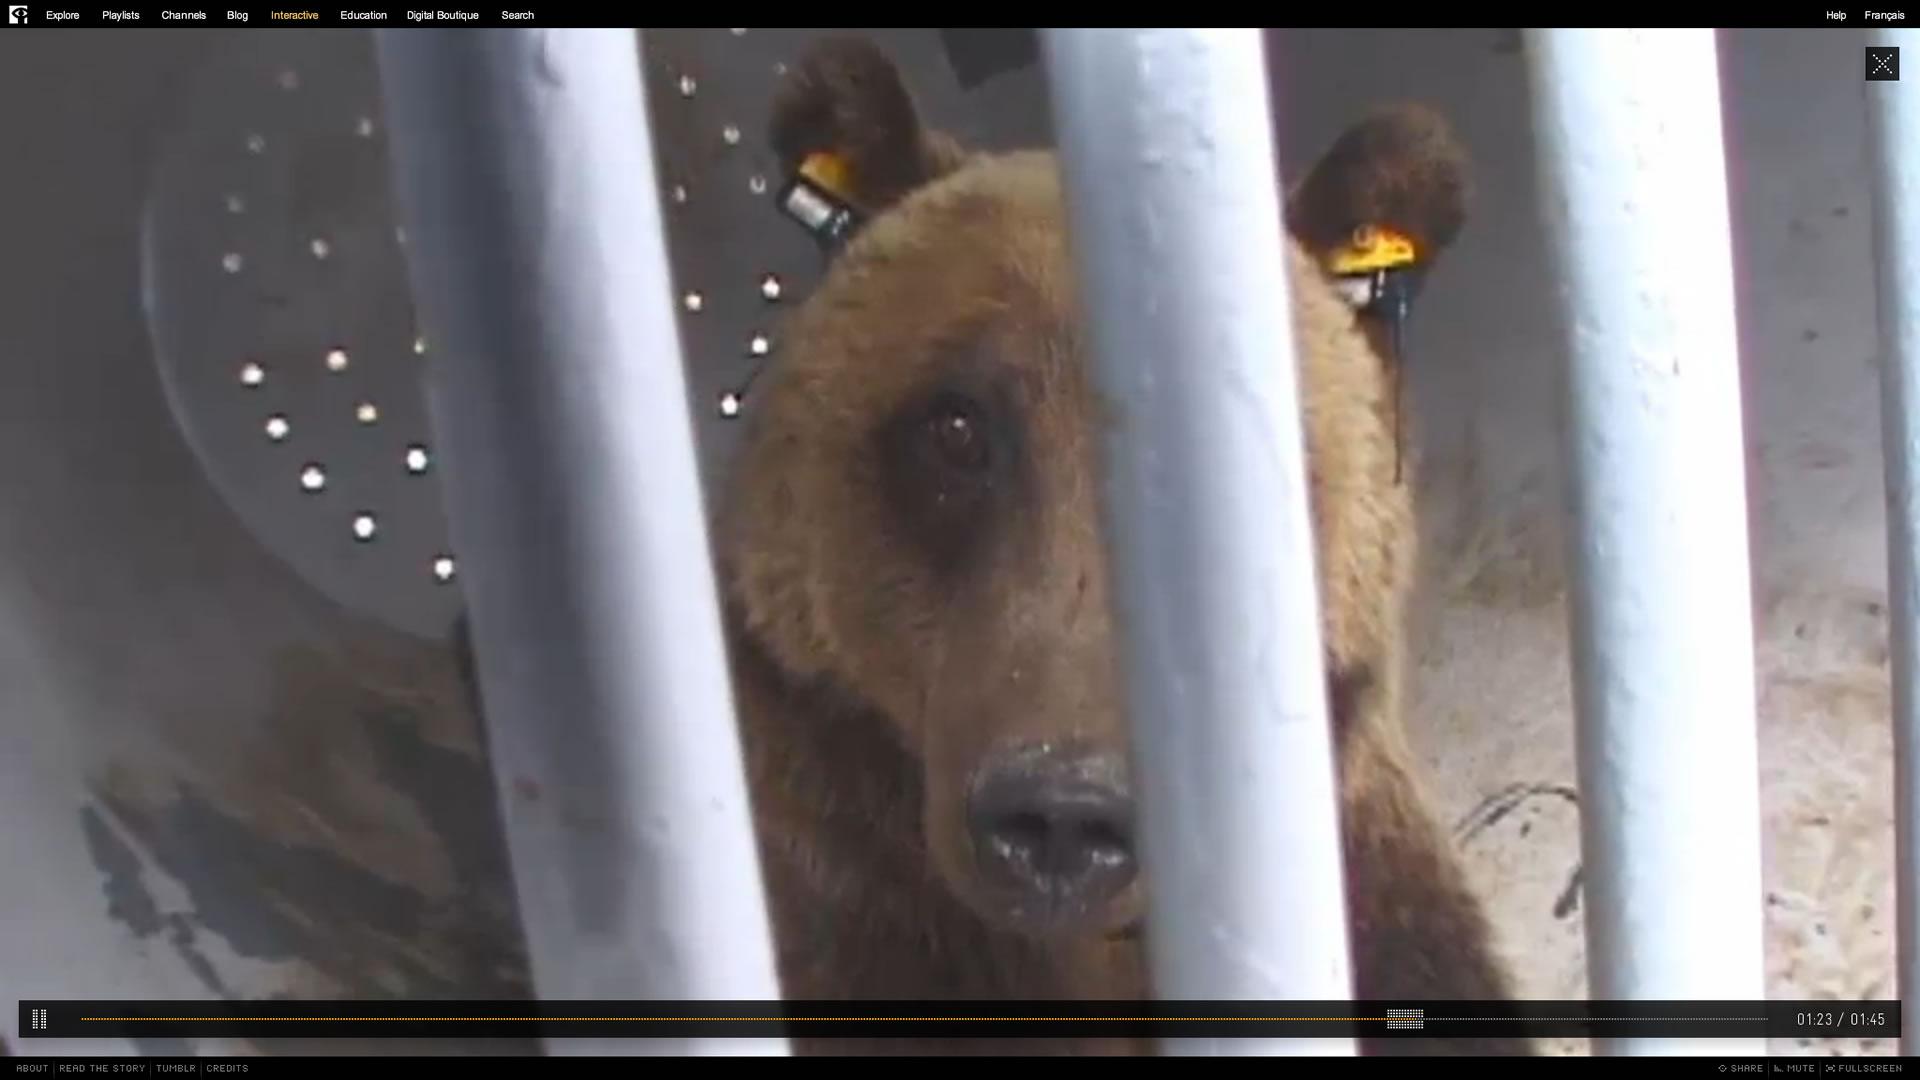 Bear 71 - Bear Behind Bars